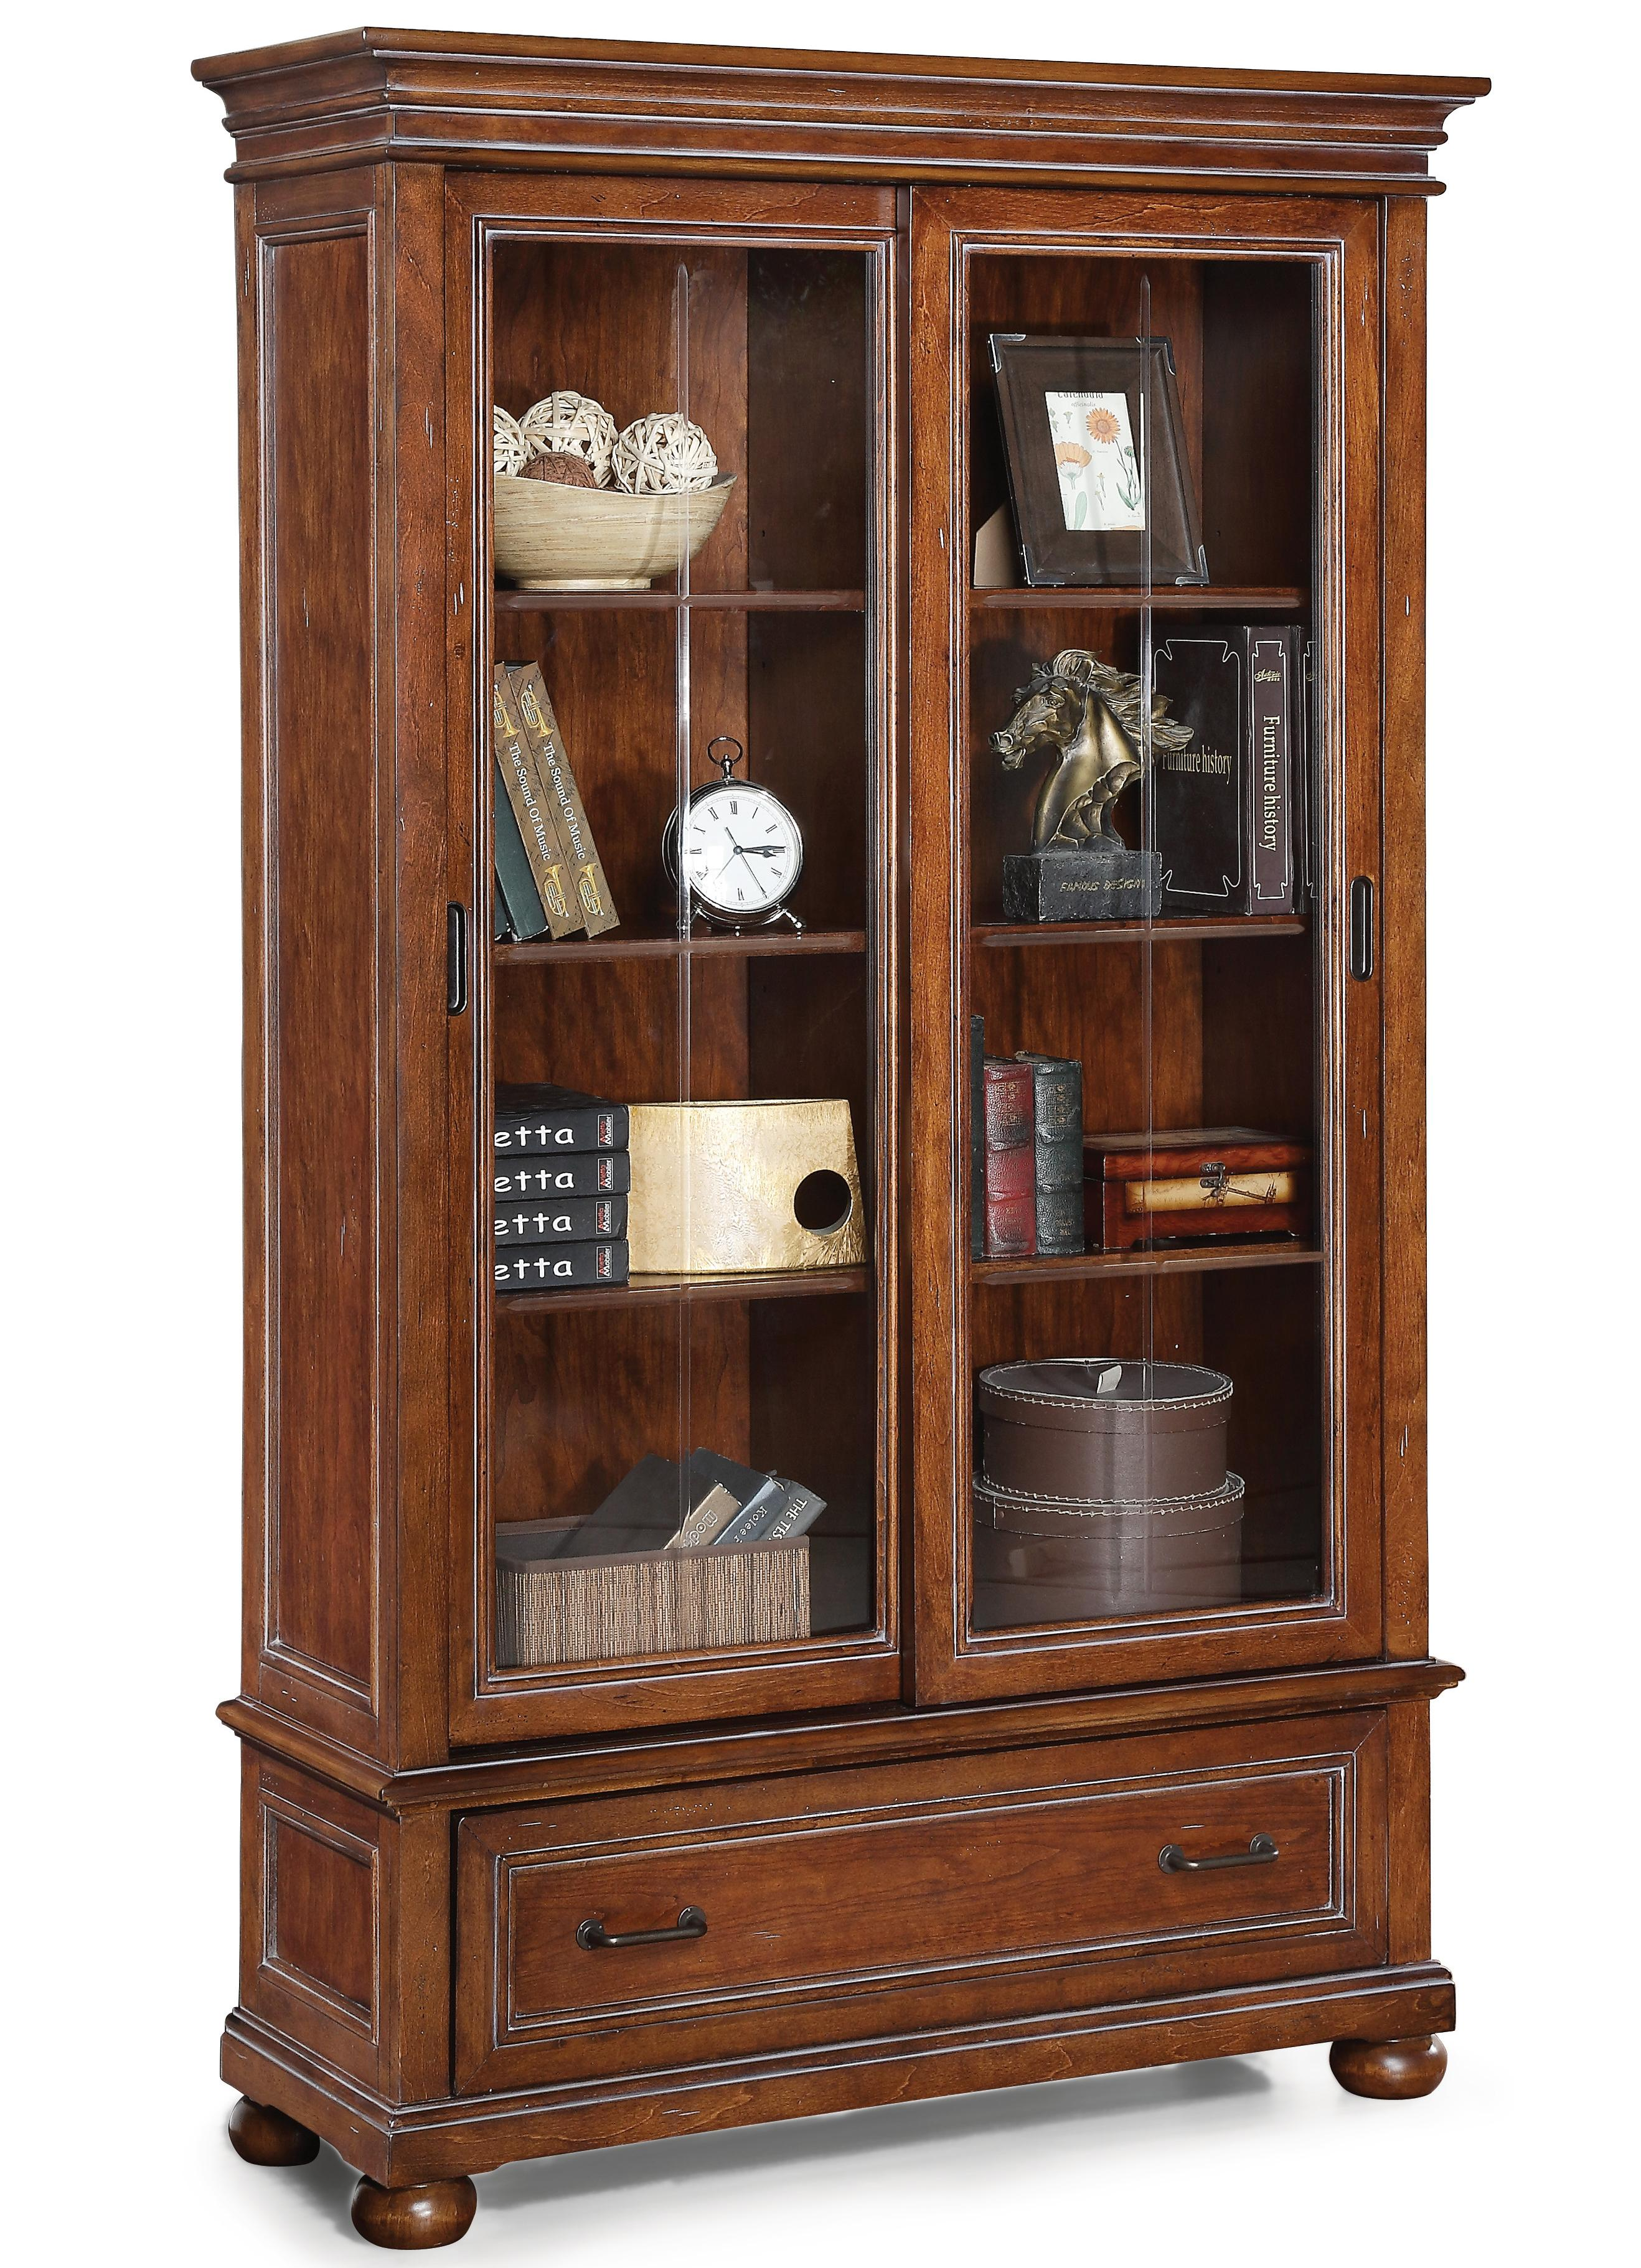 Flexsteel Wynwood Collection American Heritage Sliding Door Bookcase - Item Number: W1209-708